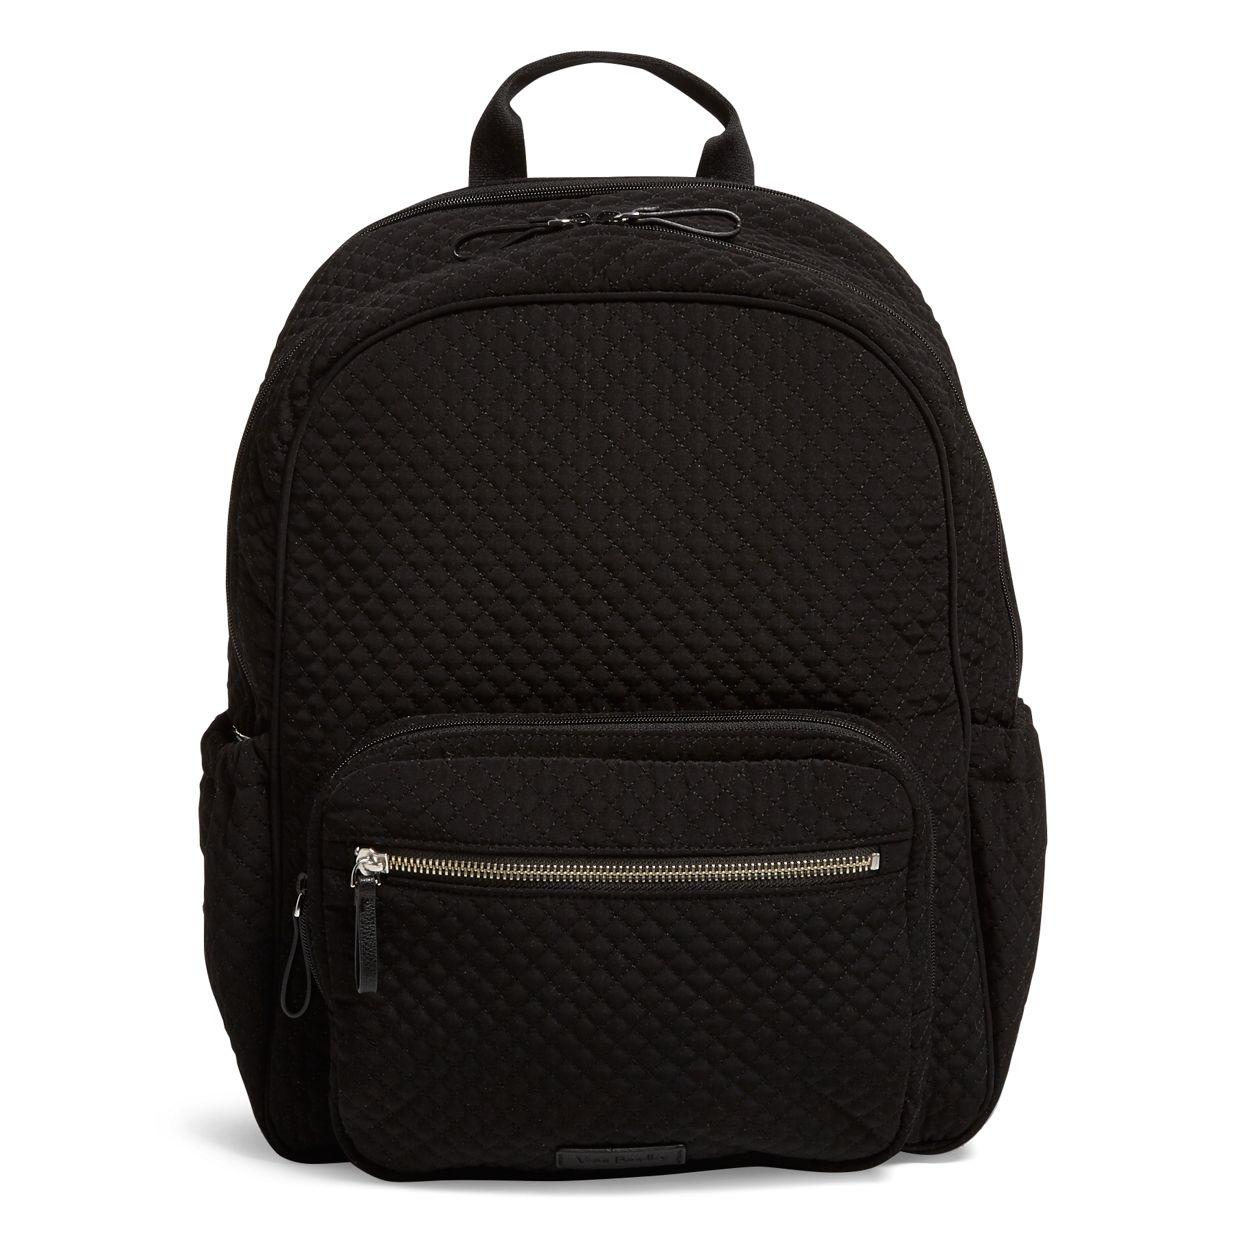 9da675c239f Image of Iconic Backpack Diaper Bag in Classic Black